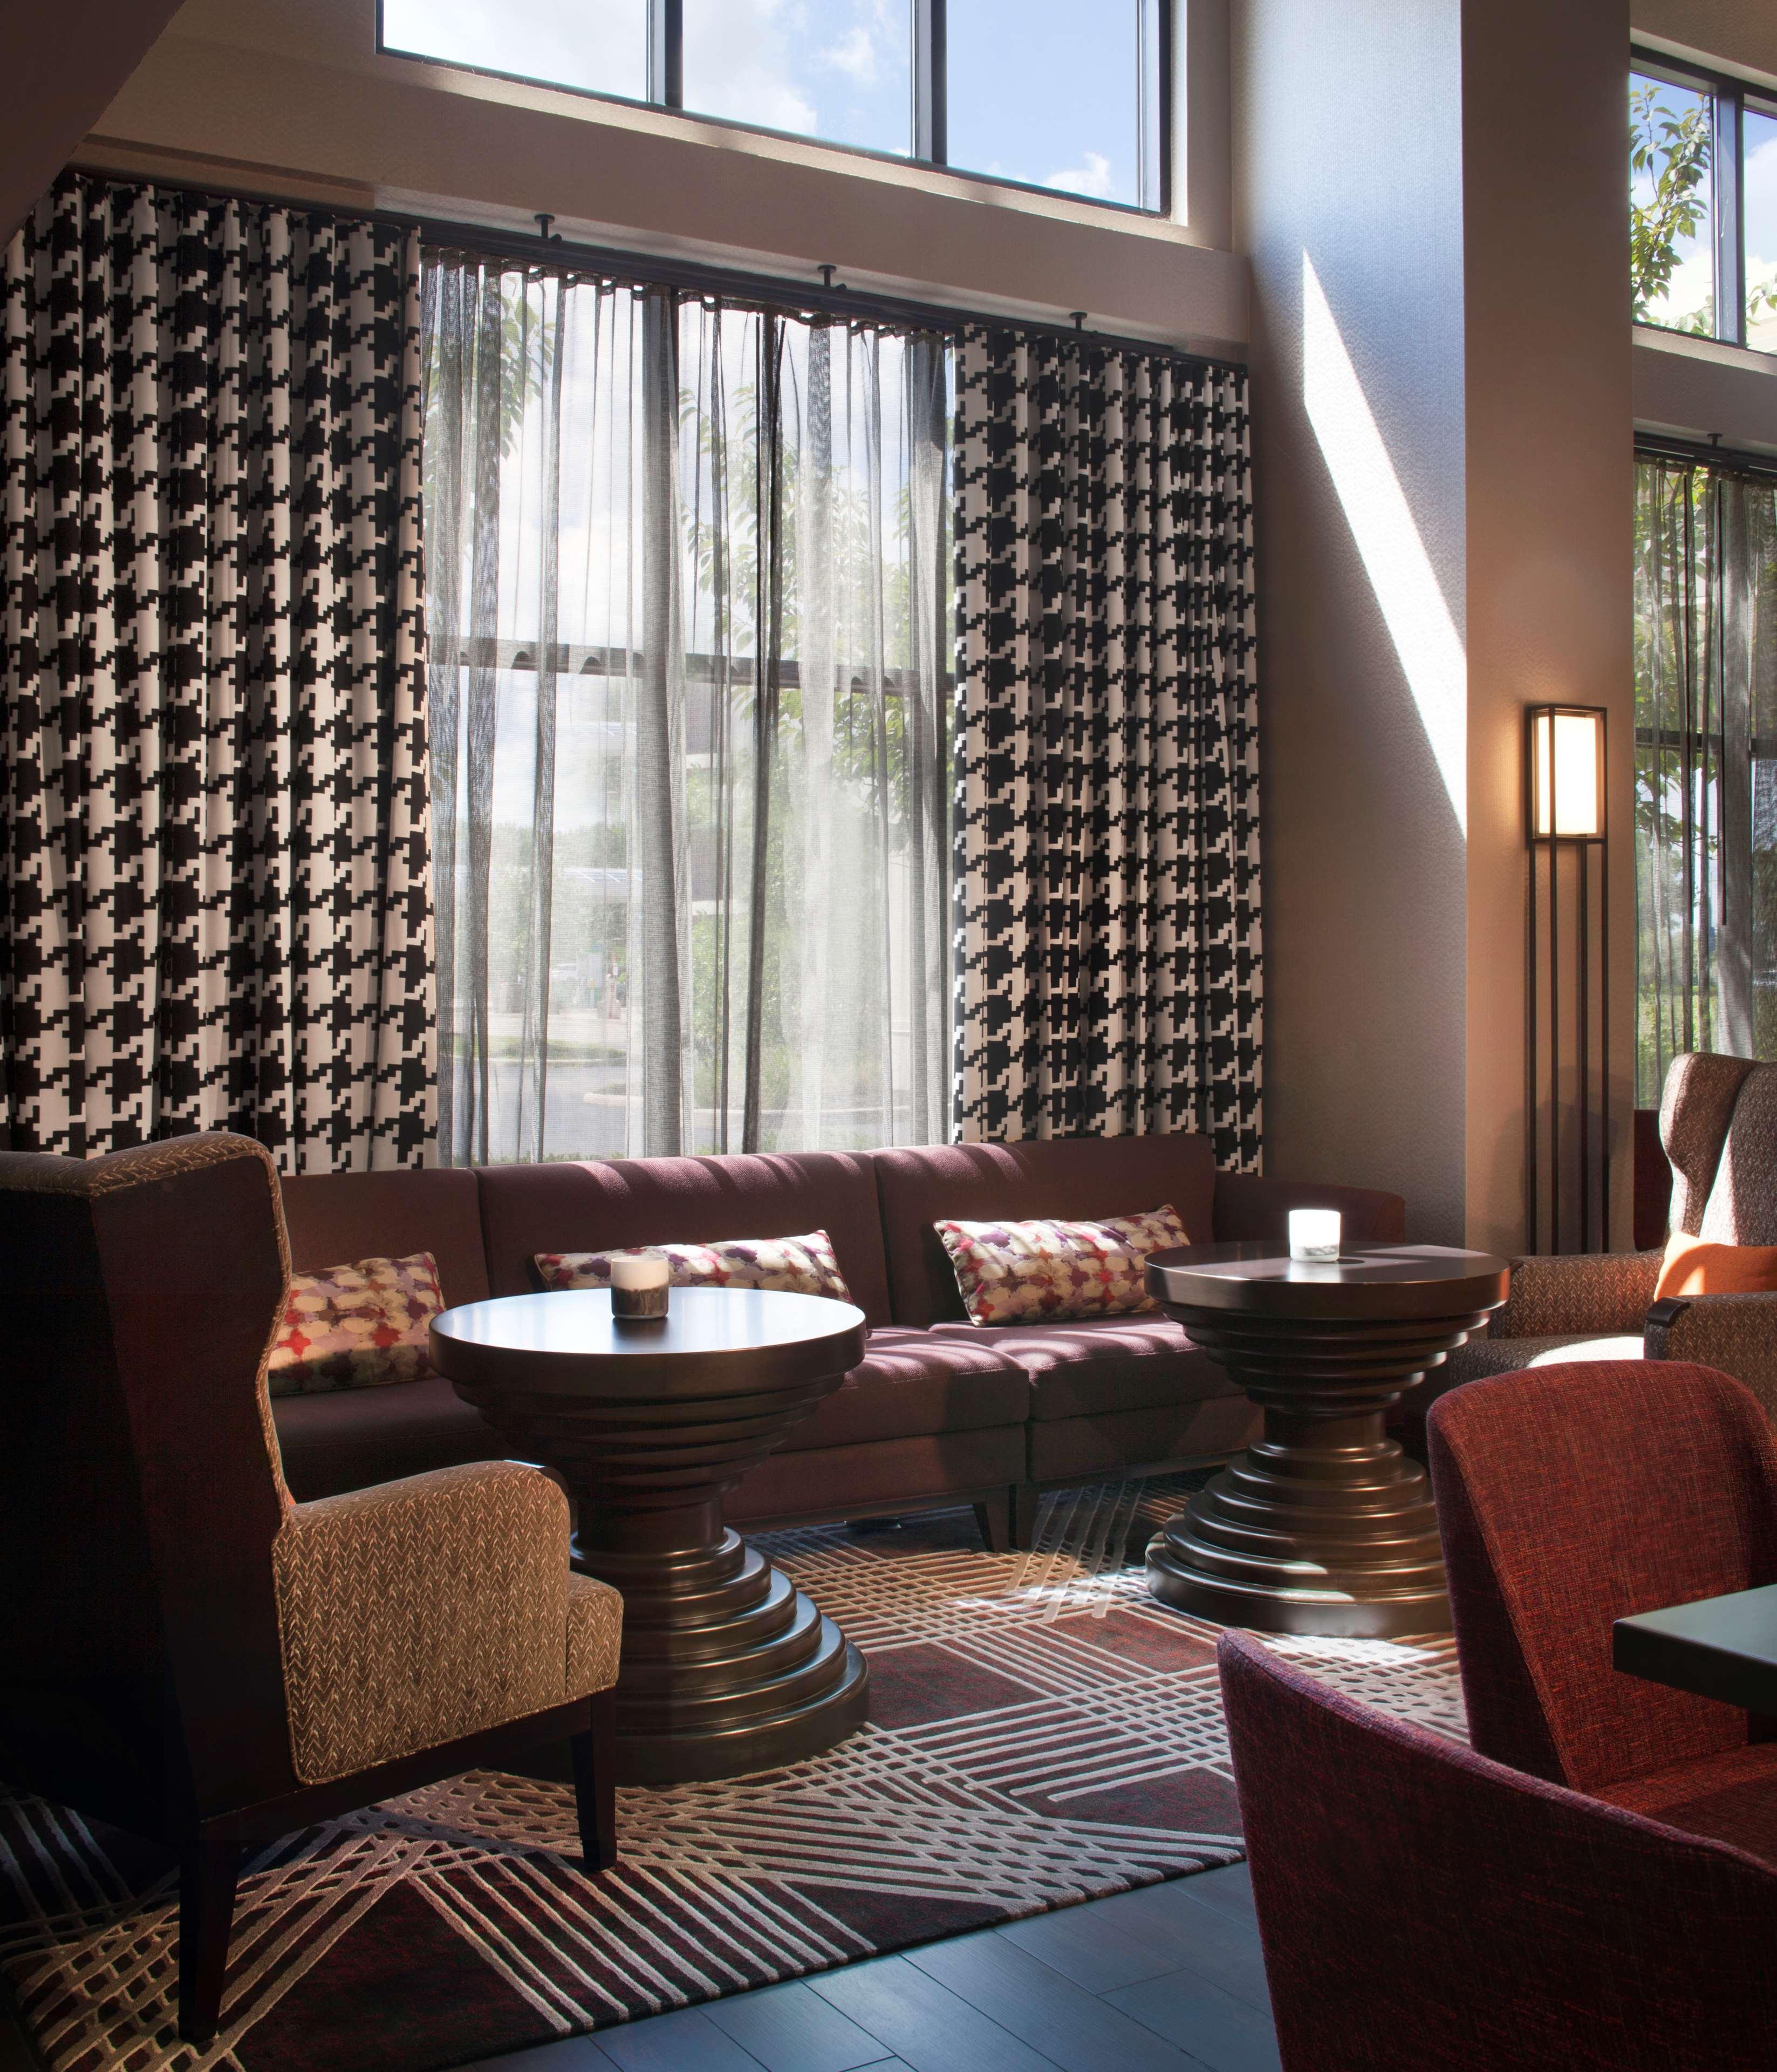 Hampton Inn & Suites Columbus-Easton Area image 4